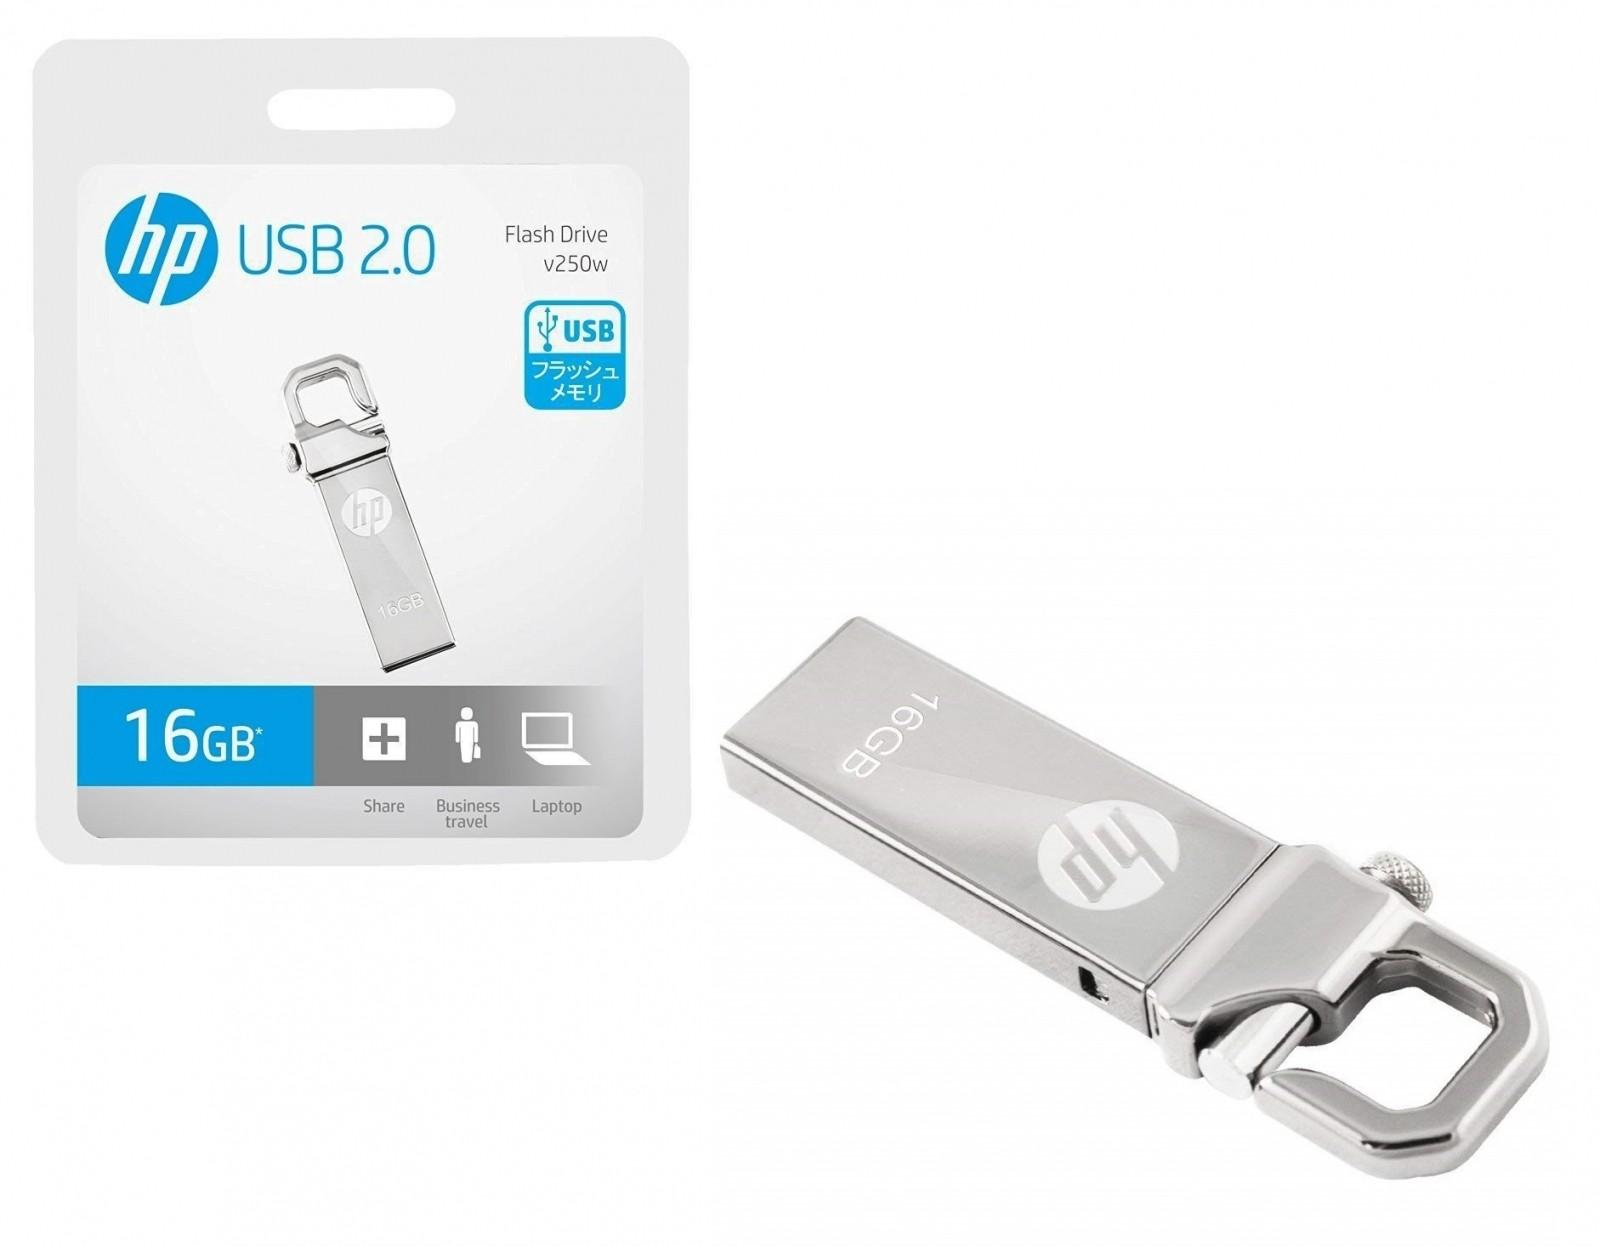 842d10d7d7a HP V250W 16GB USB 2.0 Flash Drive